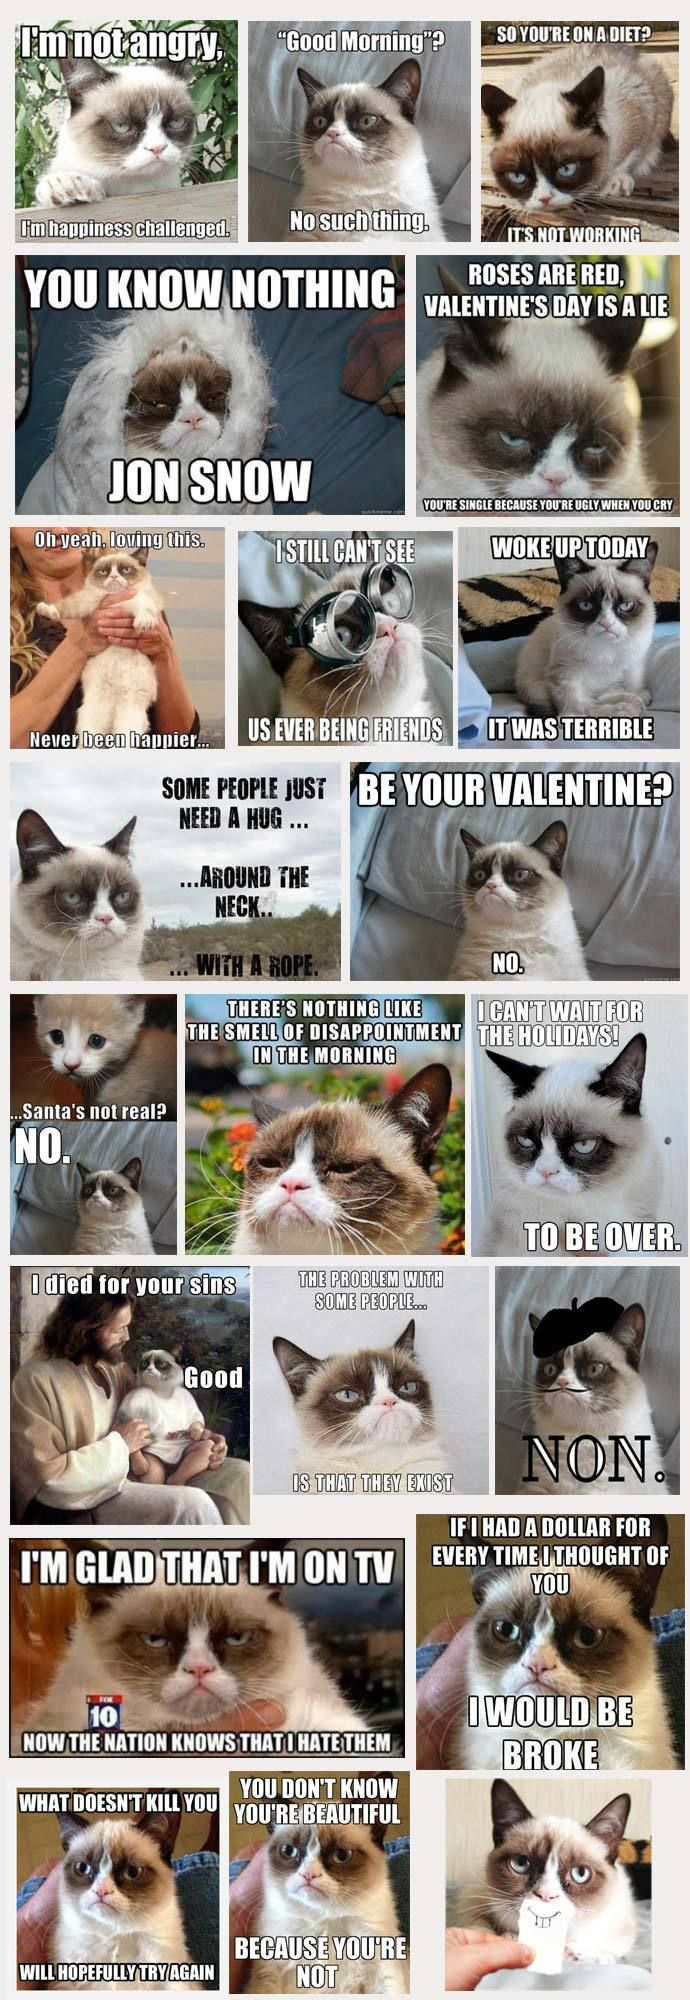 cat adoptions tampa